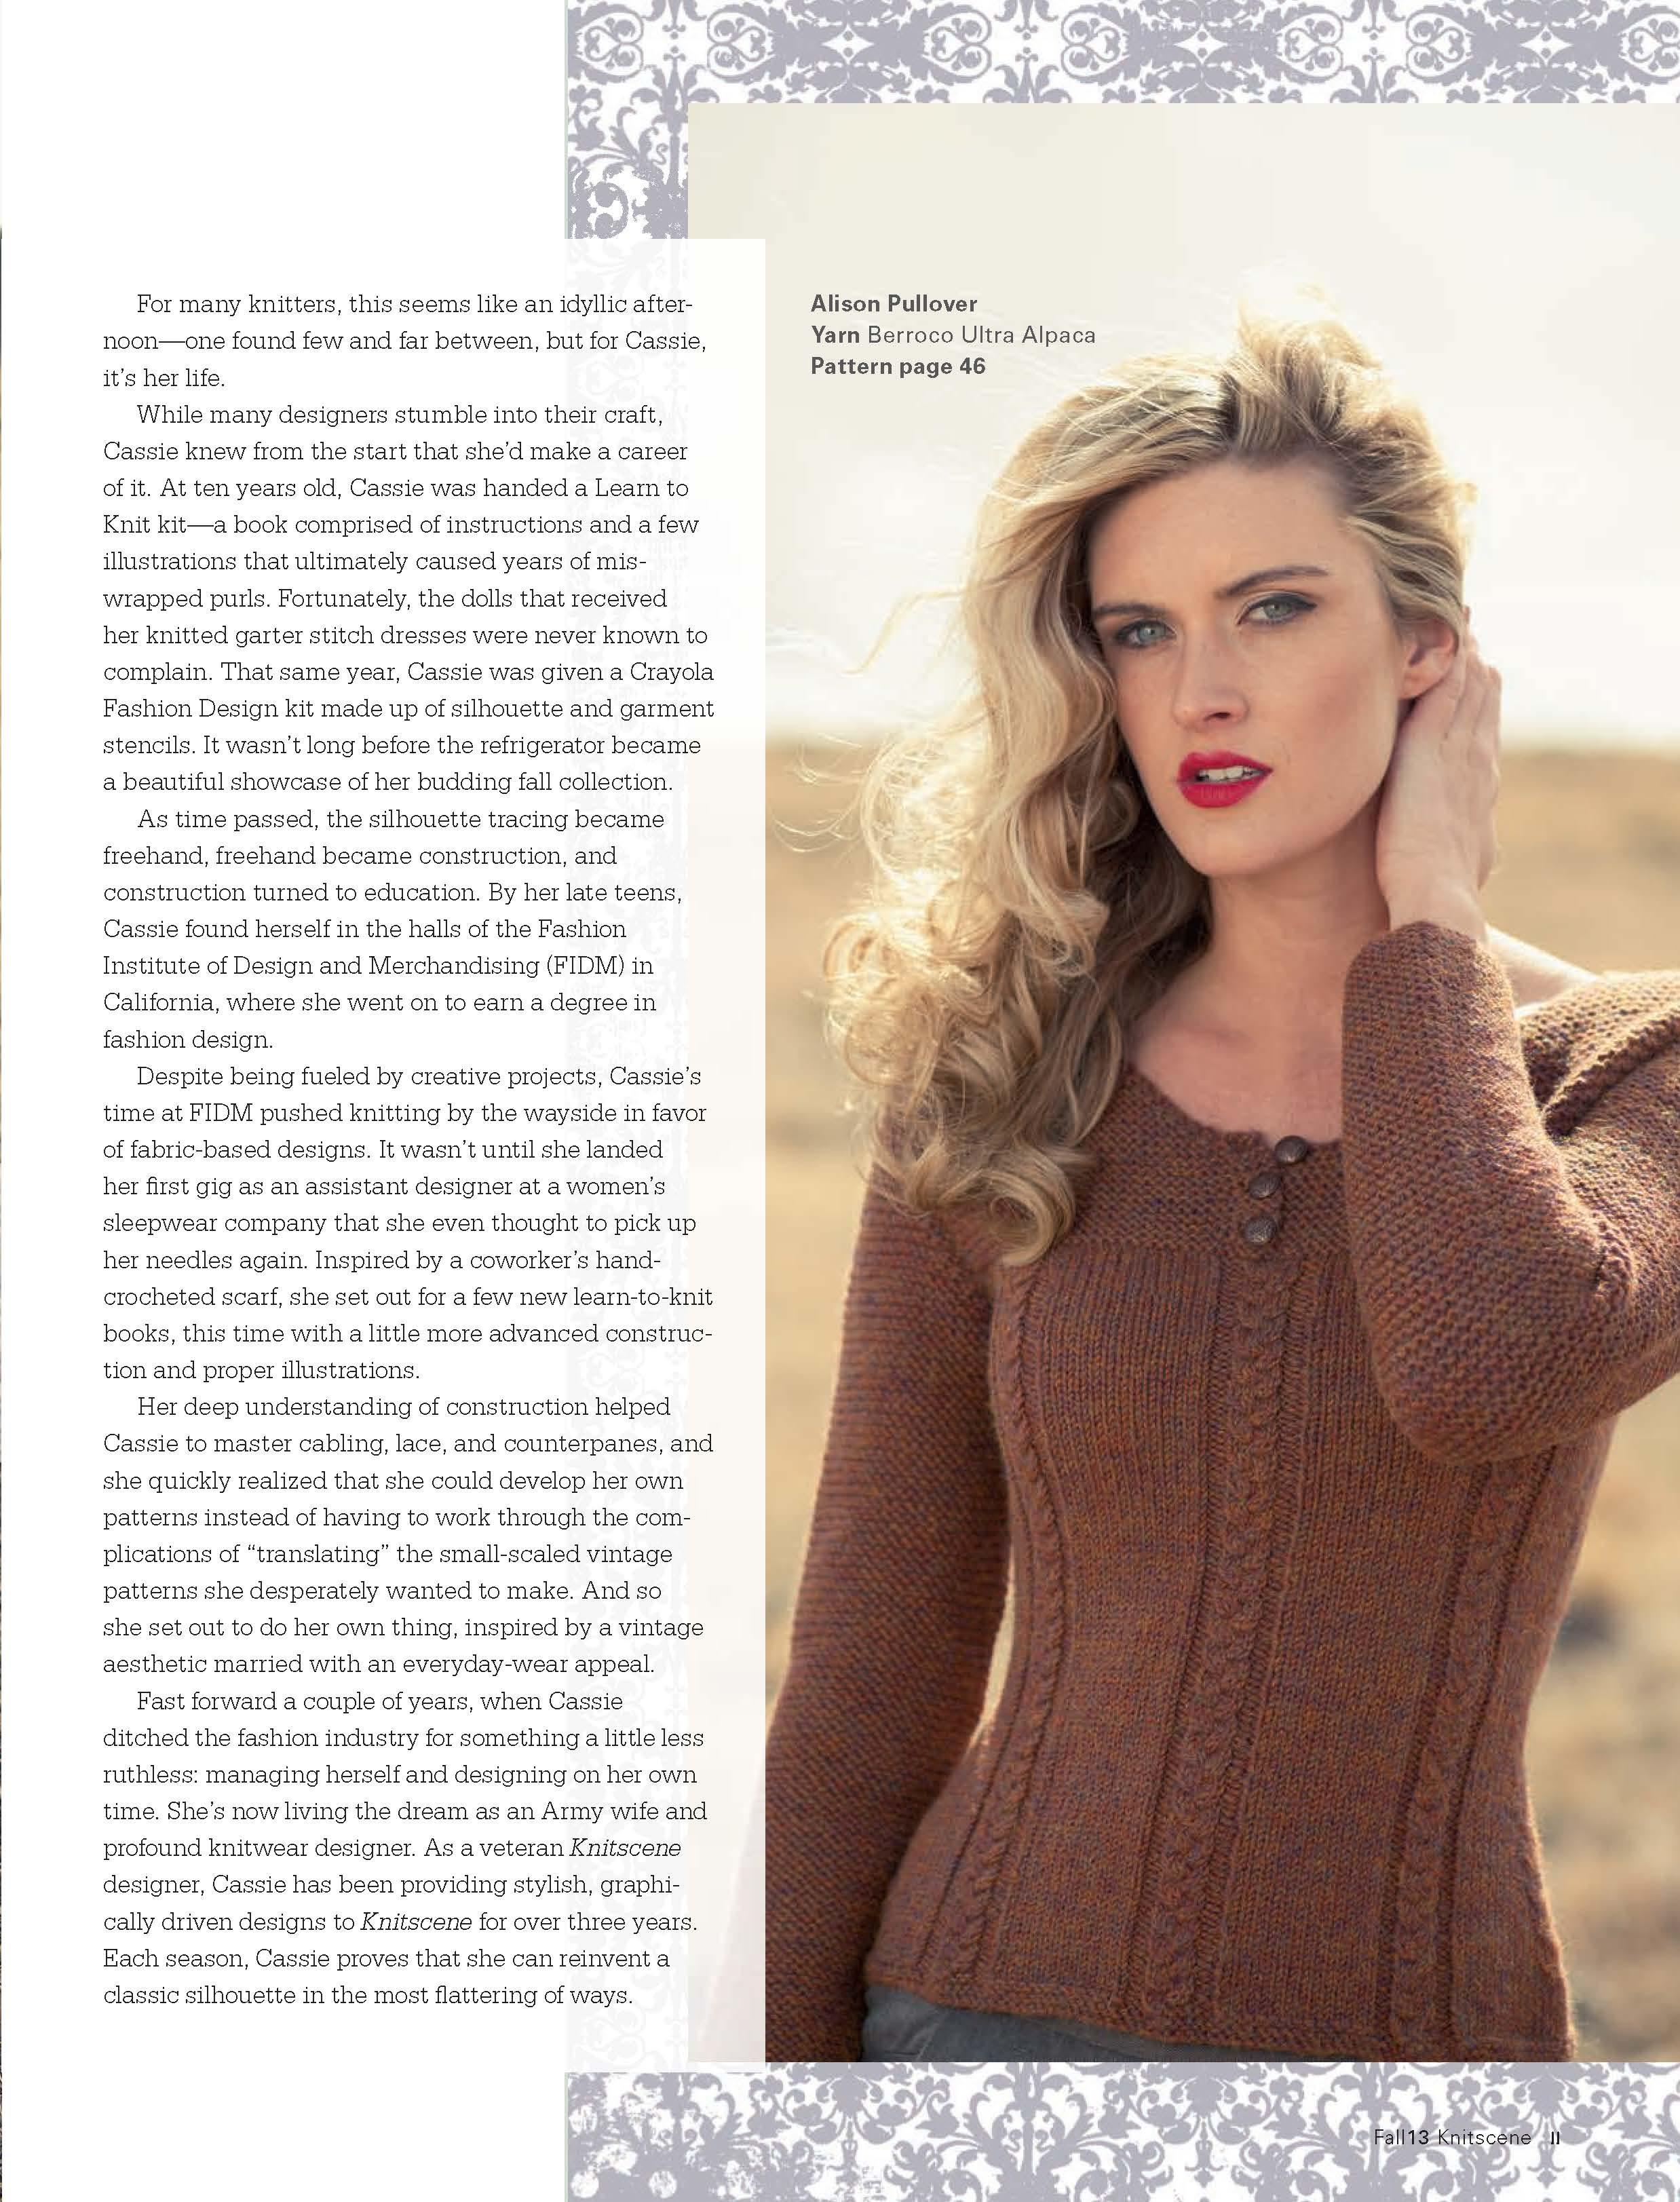 (2013) 07July01 knitscene magazine_Page_013.jpg